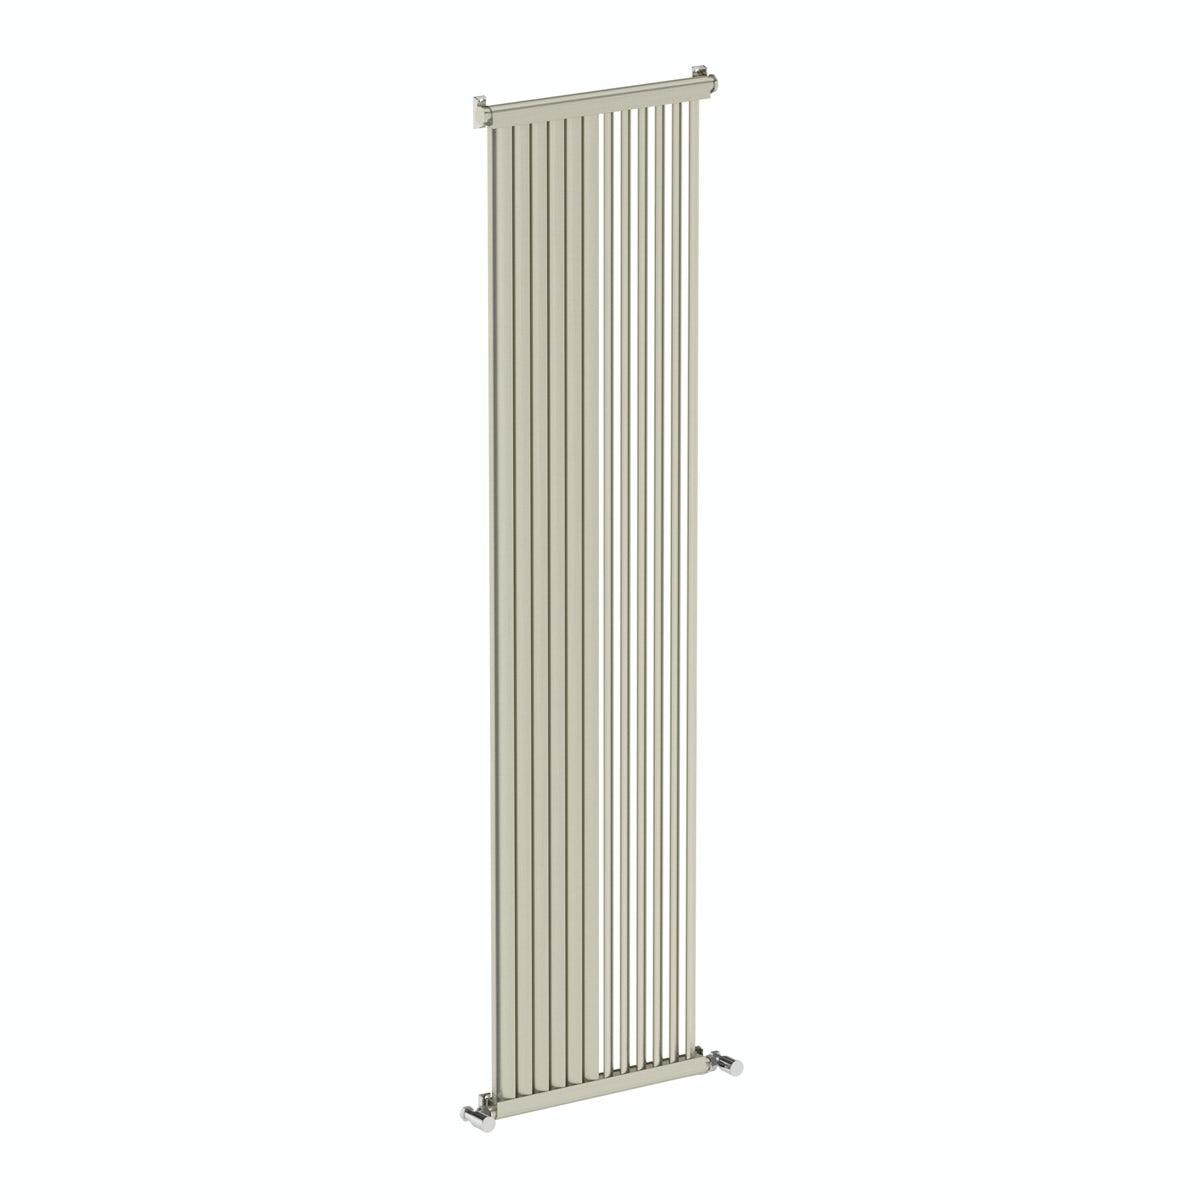 Mode Zephyra vertical radiator 1800 x 468